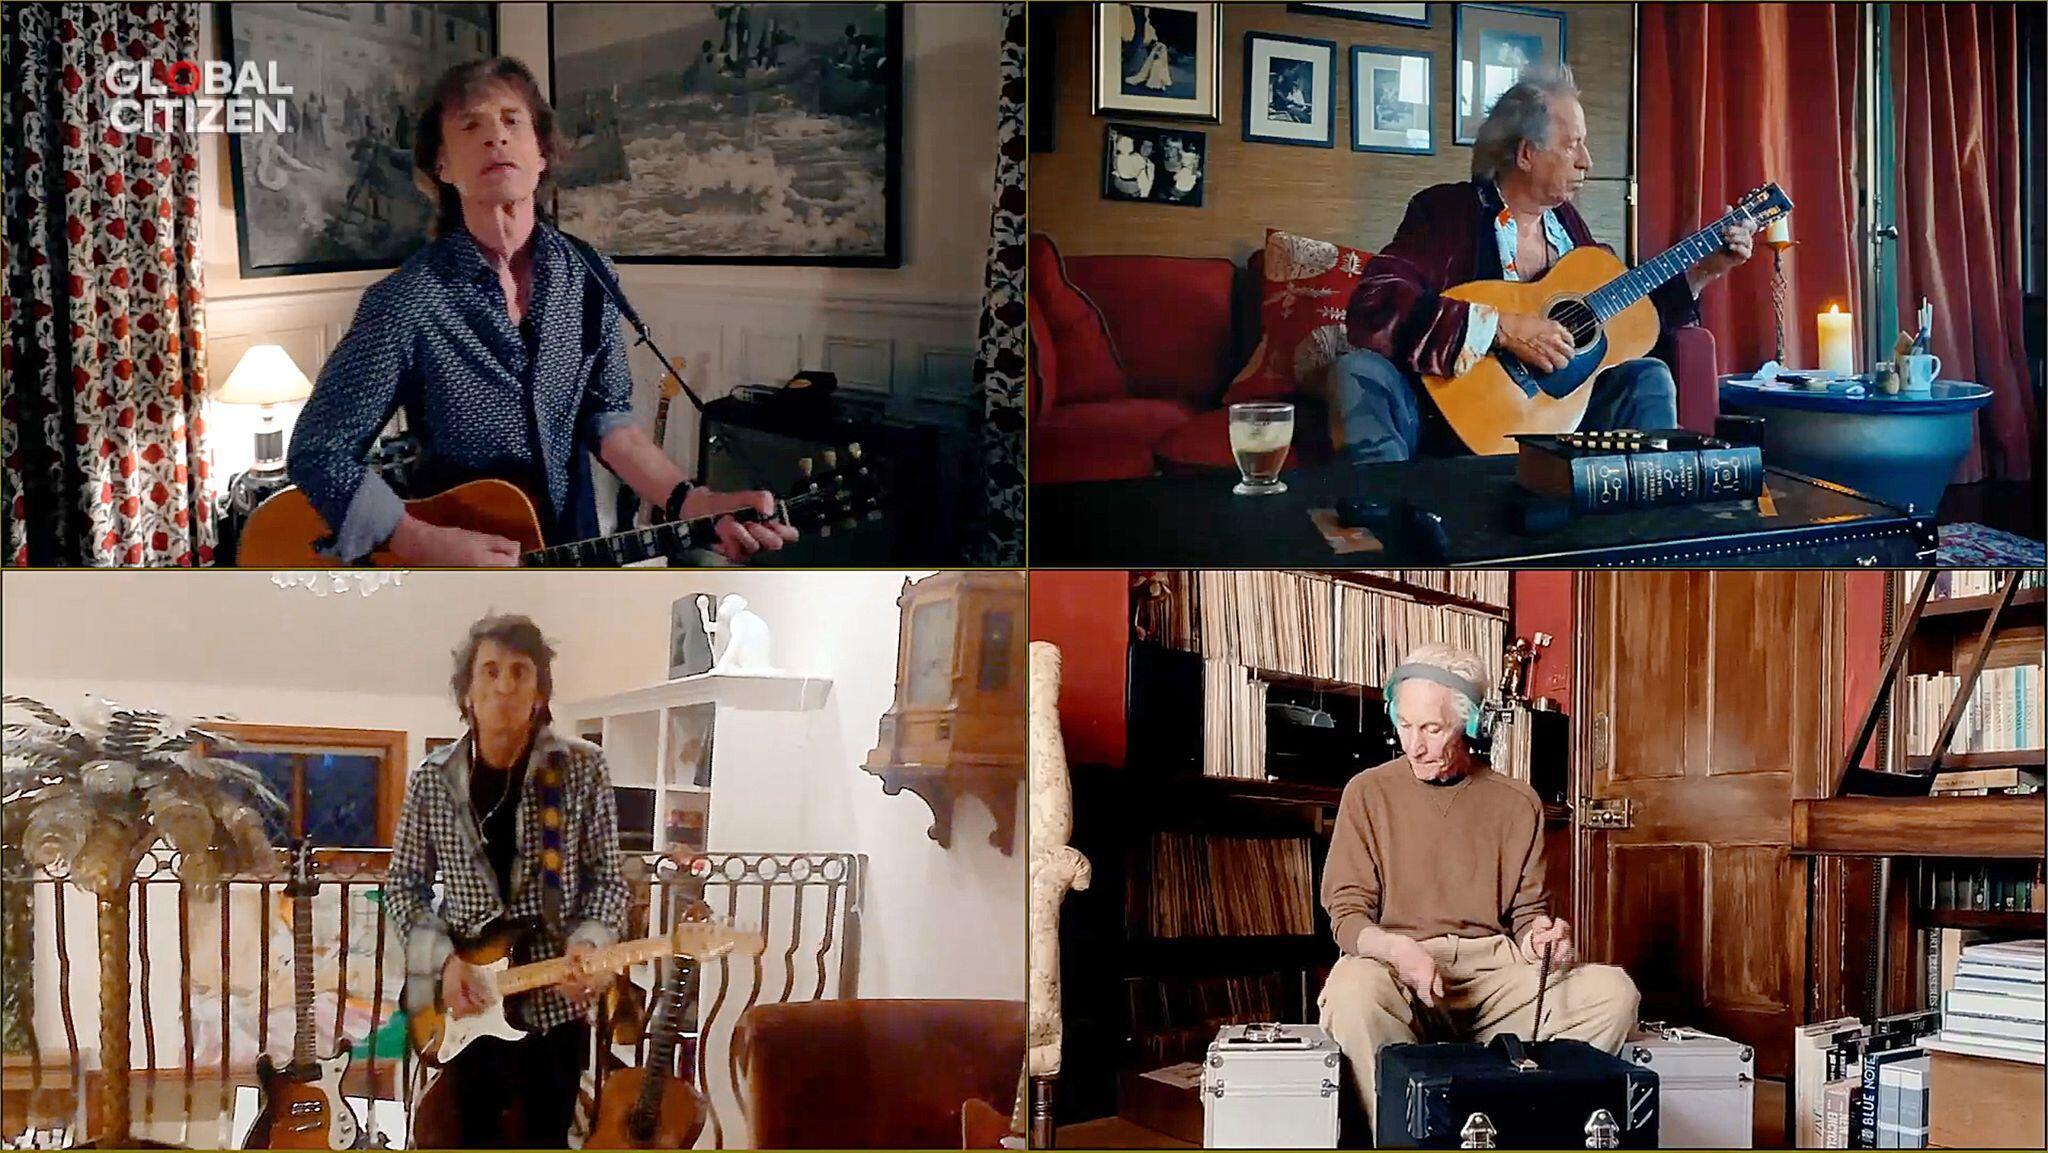 Bild zu Global Citizen Konzert - Rolling Stones